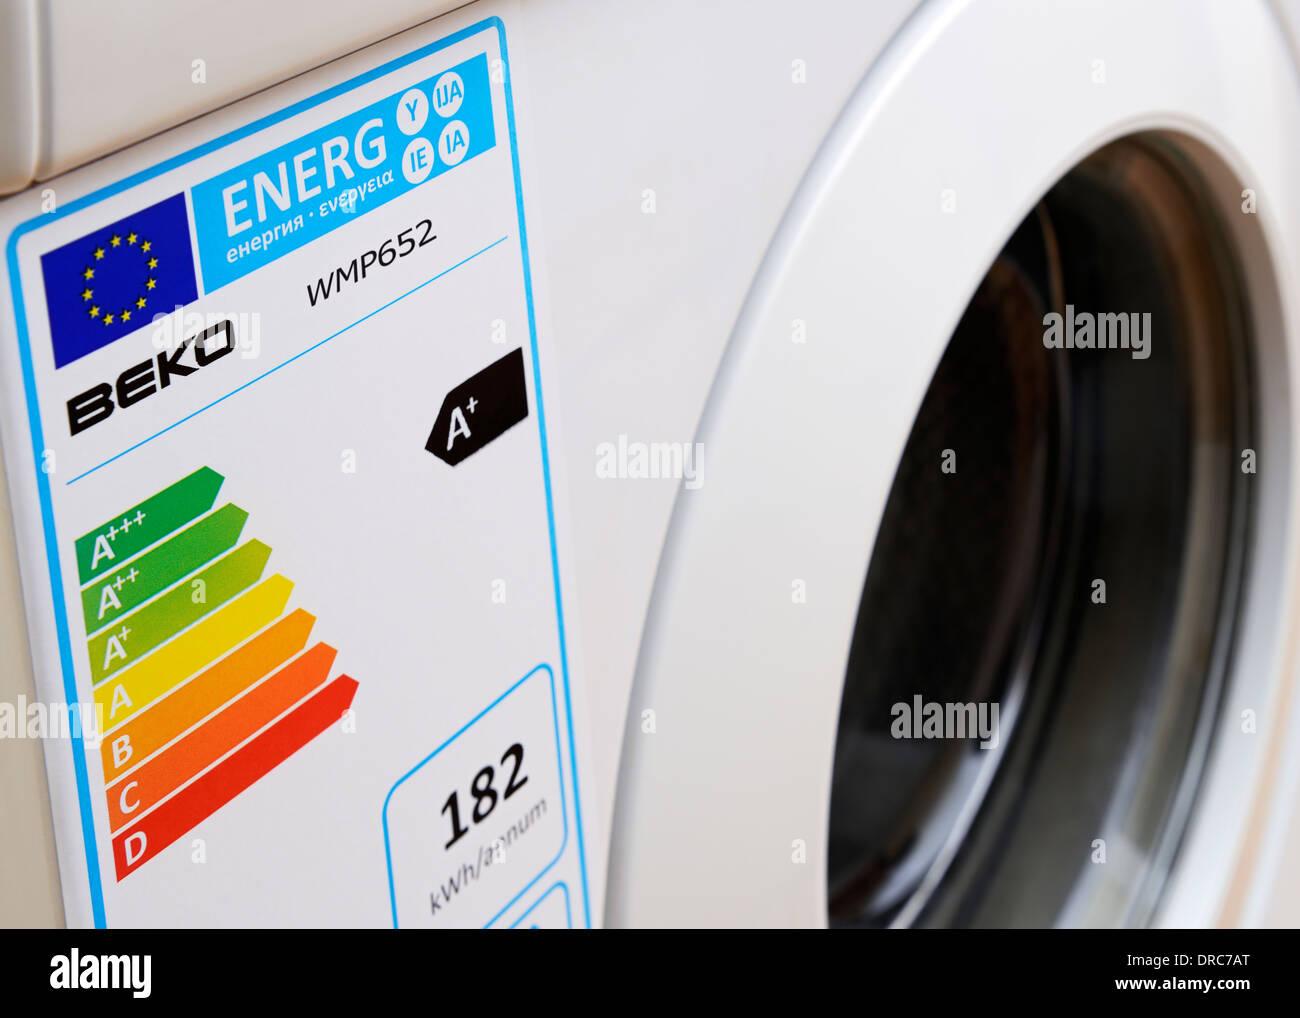 European Union Energy Consumption Label on a Washing Machine. - Stock Image